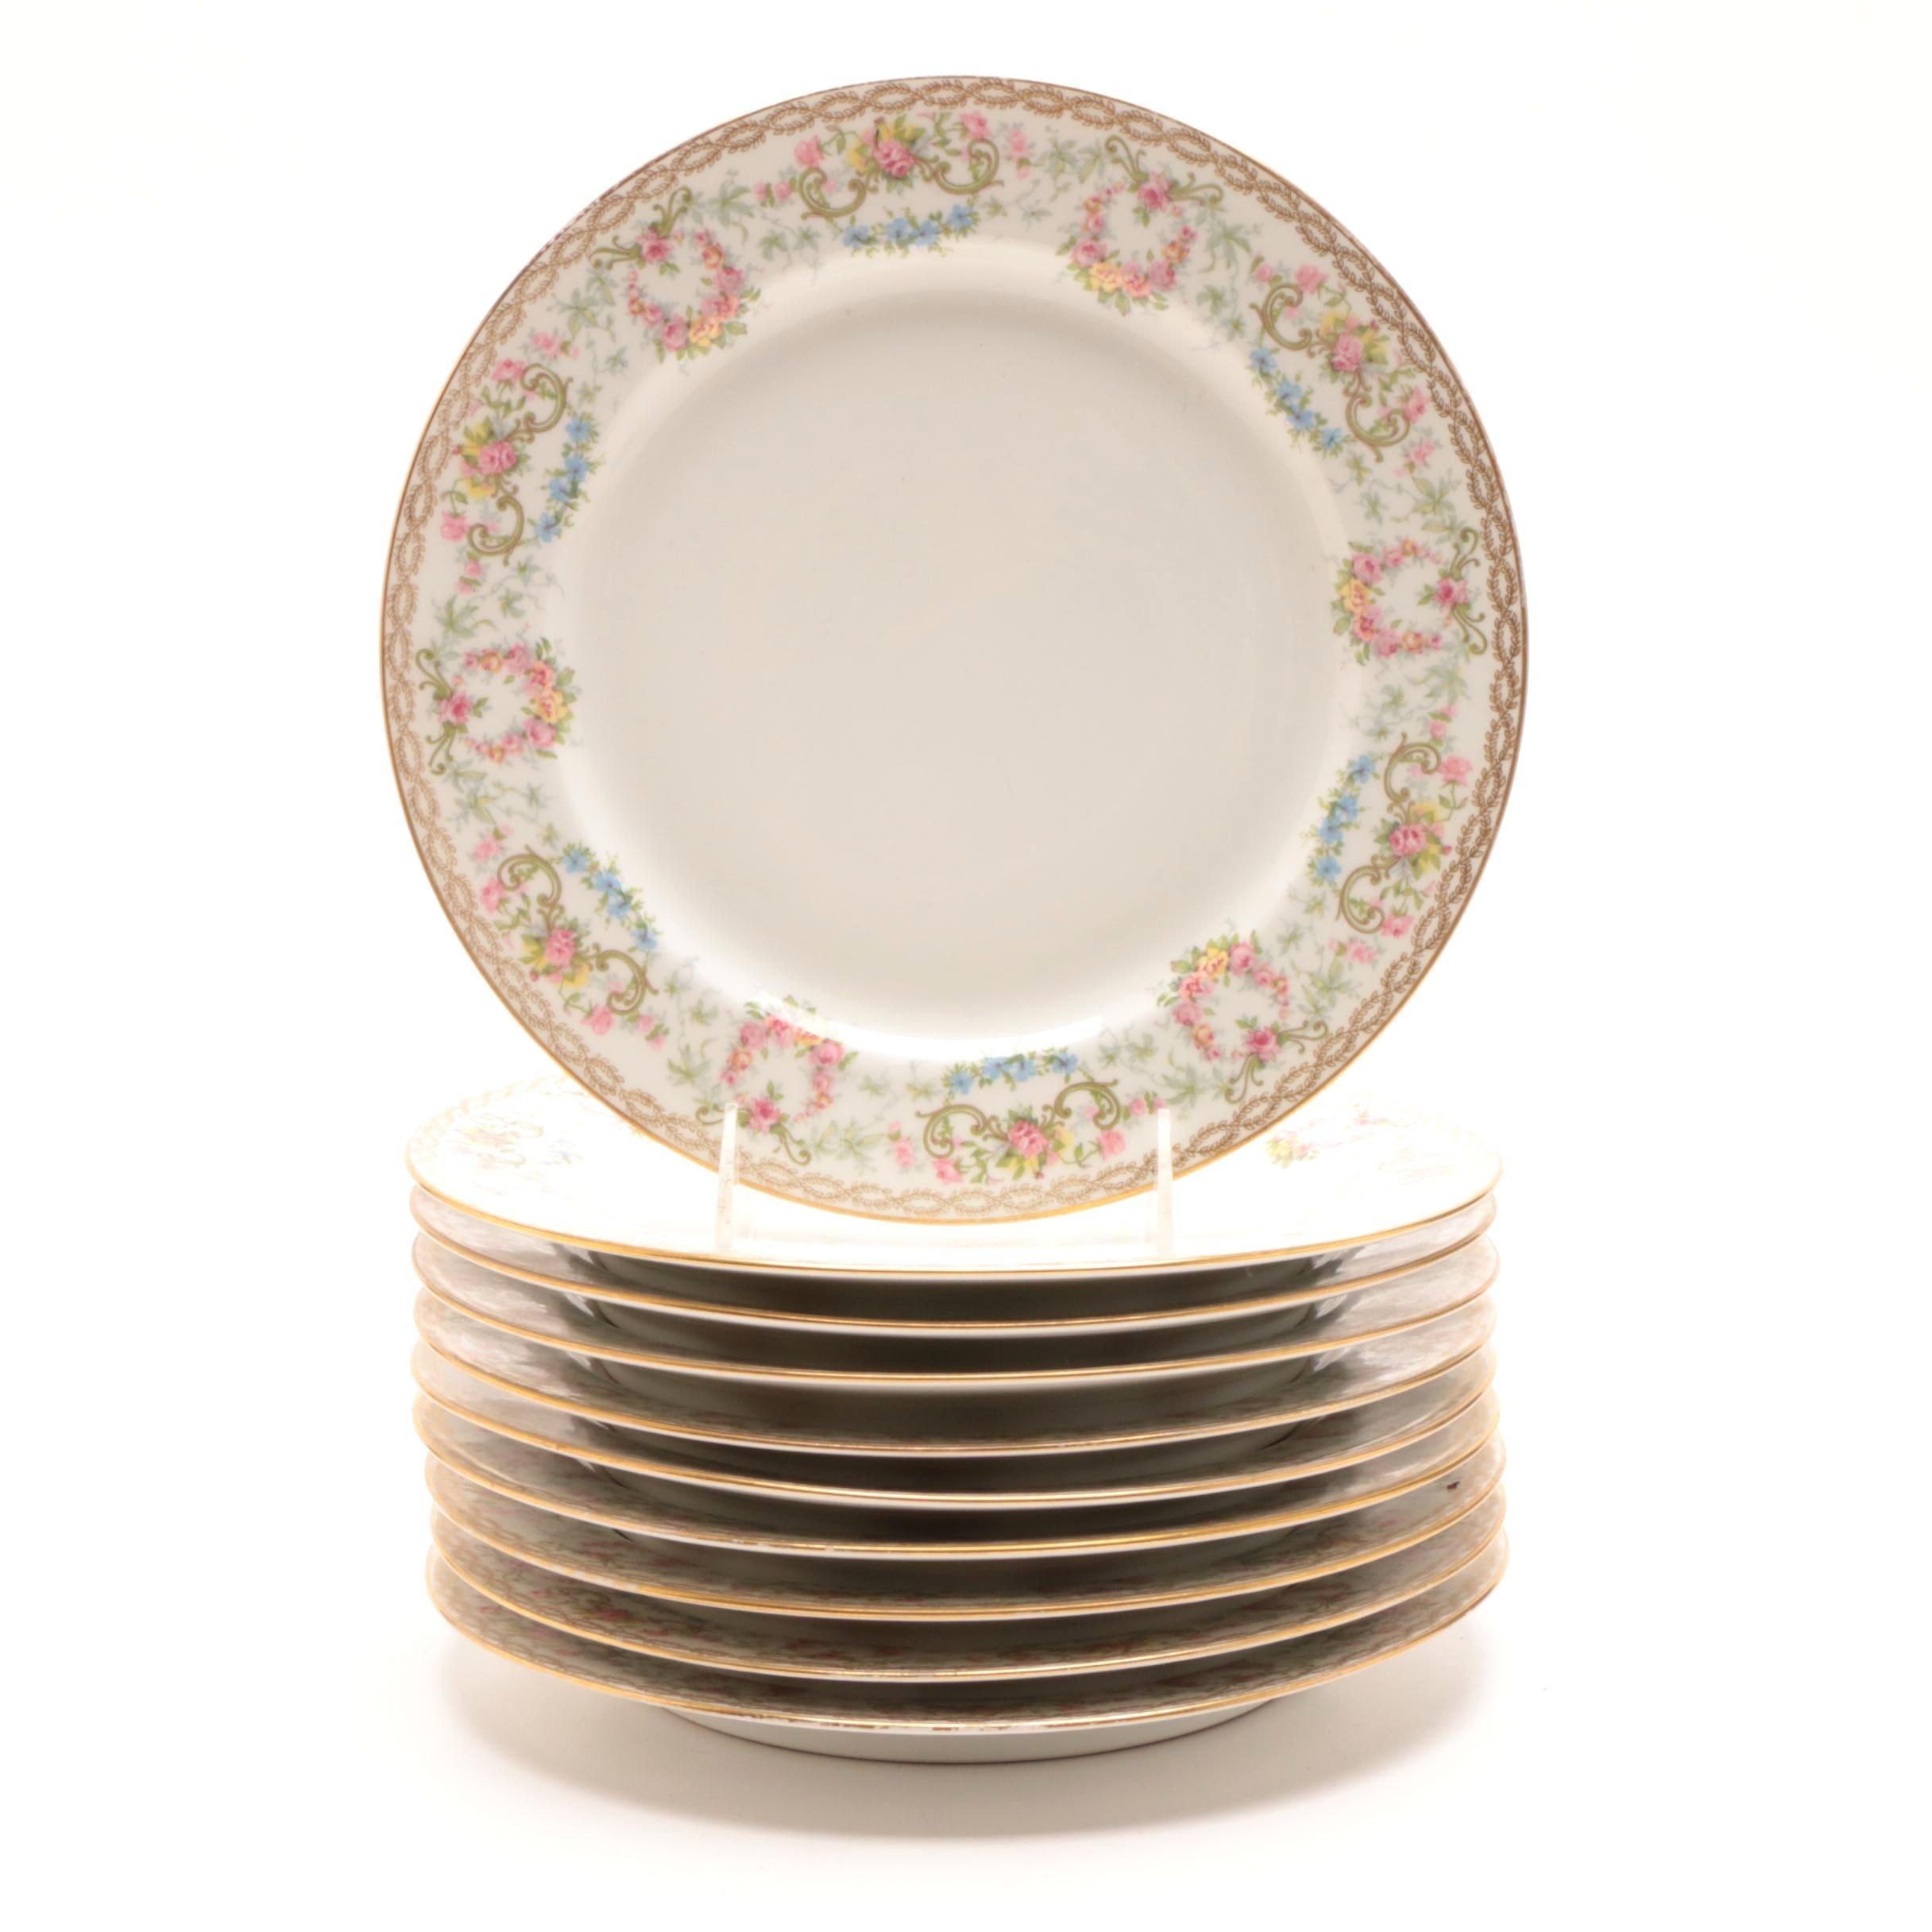 J. Pouyat Limoges Porcelain Dinner Plates